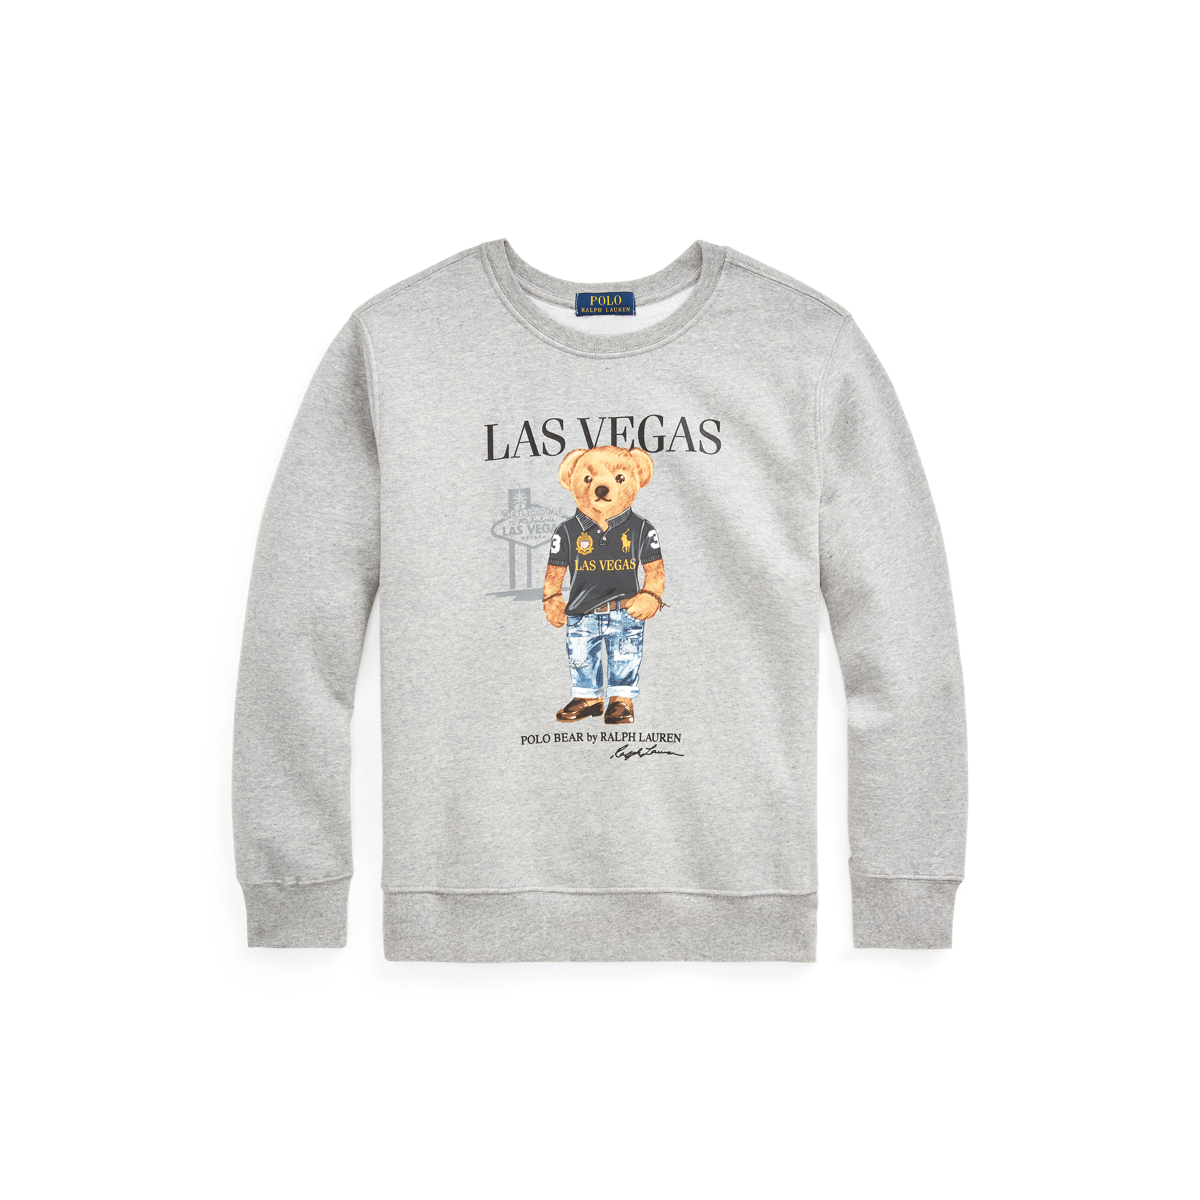 Polo Bear - Las Vegas Bear Sweatshirt